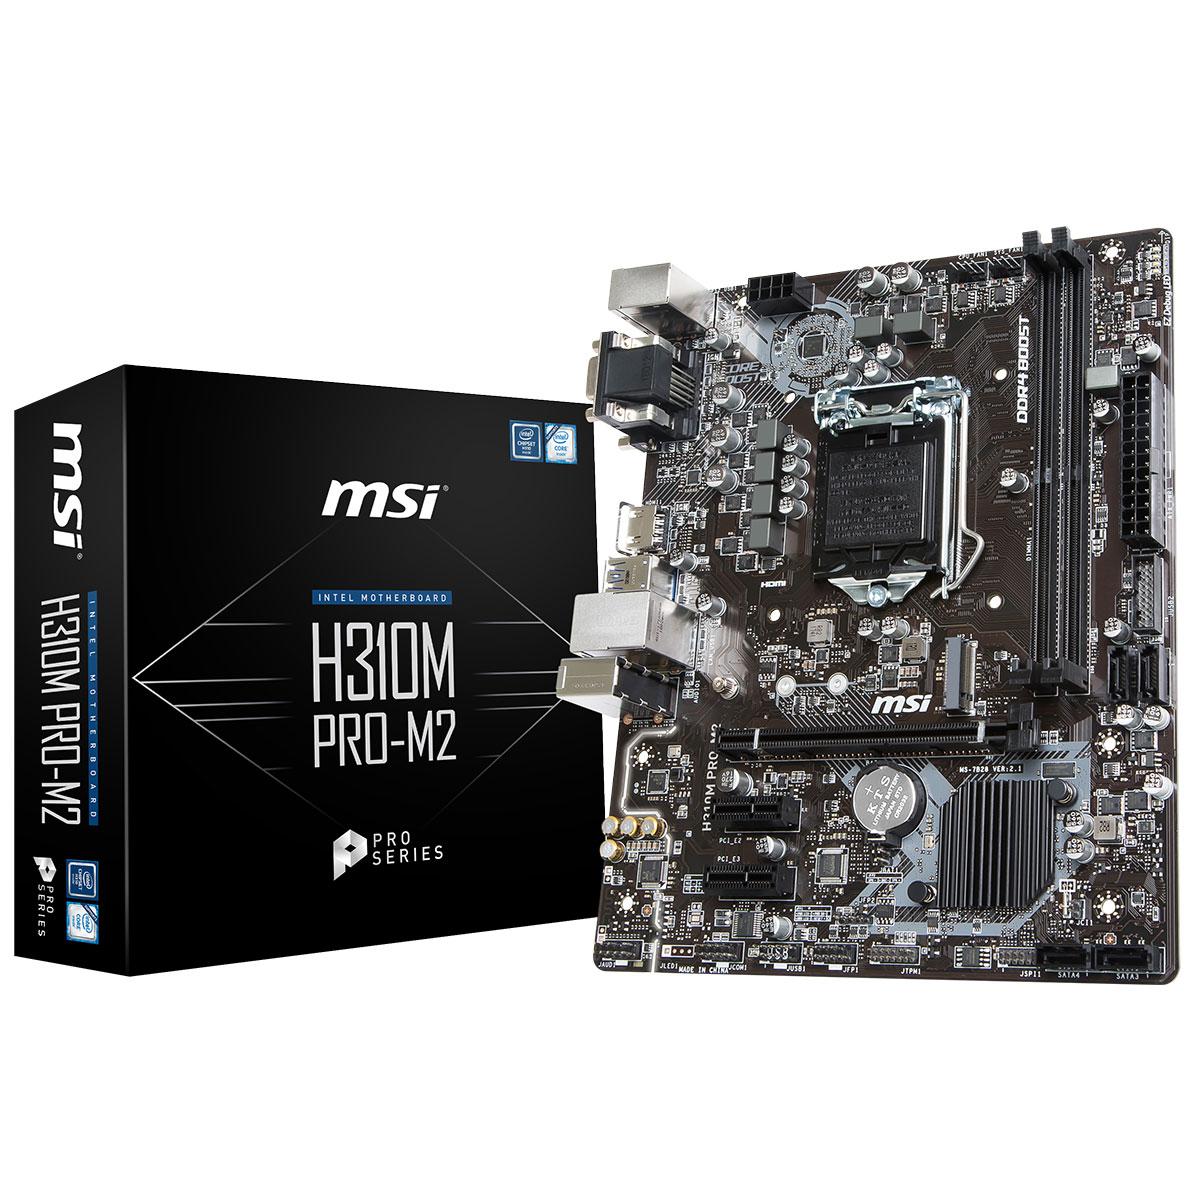 MSI H310M PRO-M2 Micro-ATX DDR4 - Carte mère MSI - Cybertek.fr - 0